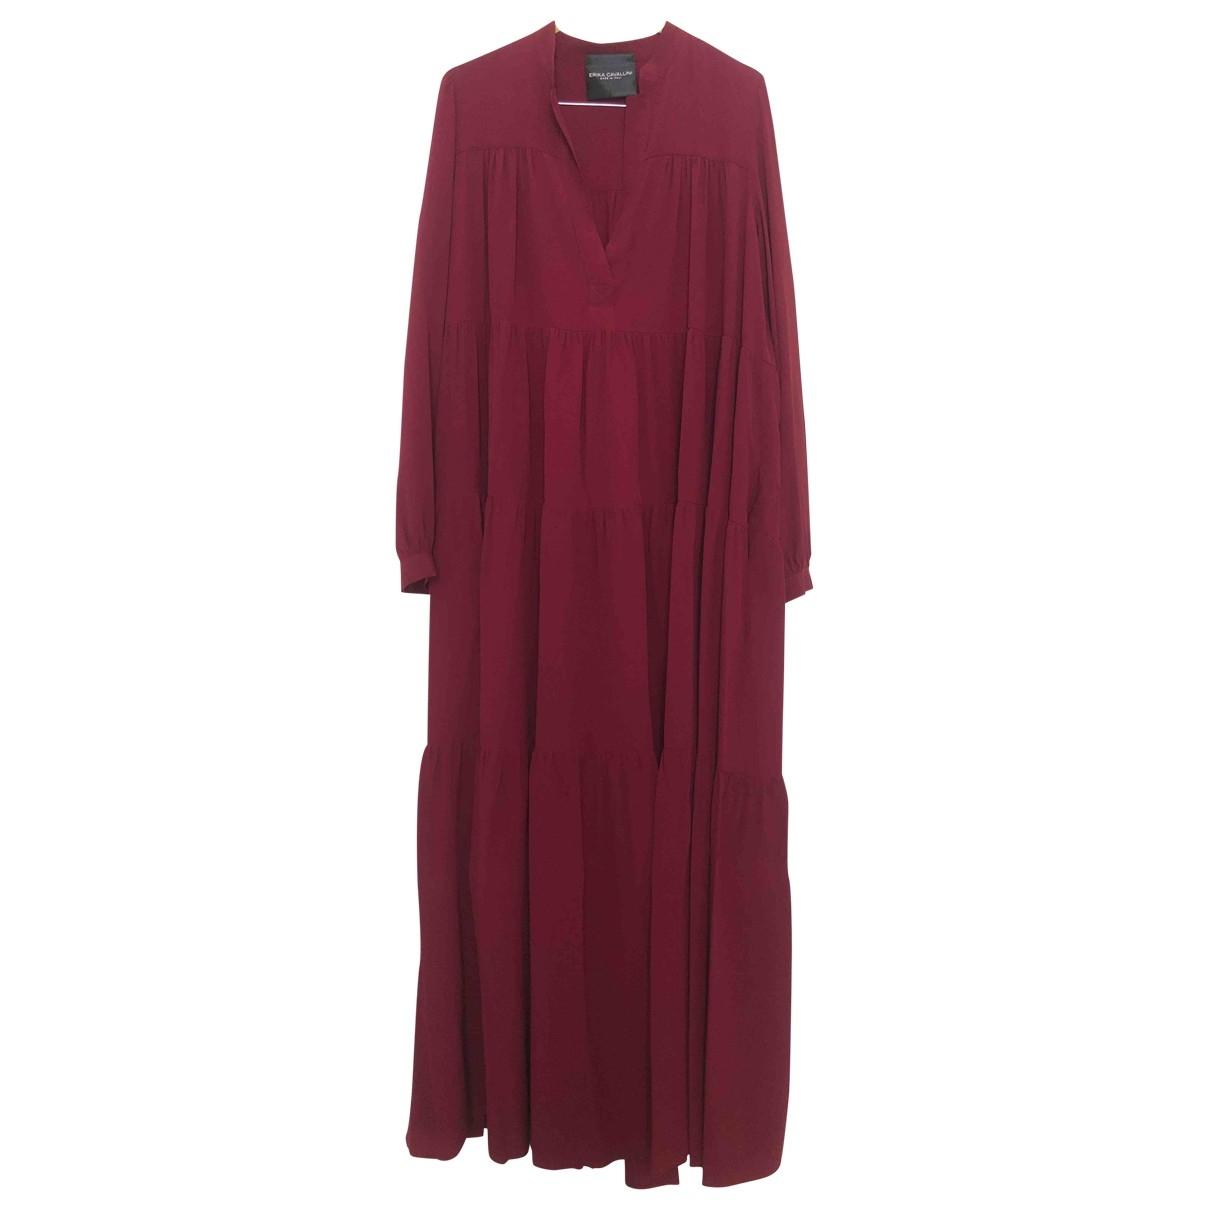 Erika Cavallini \N Burgundy Silk dress for Women 40 IT